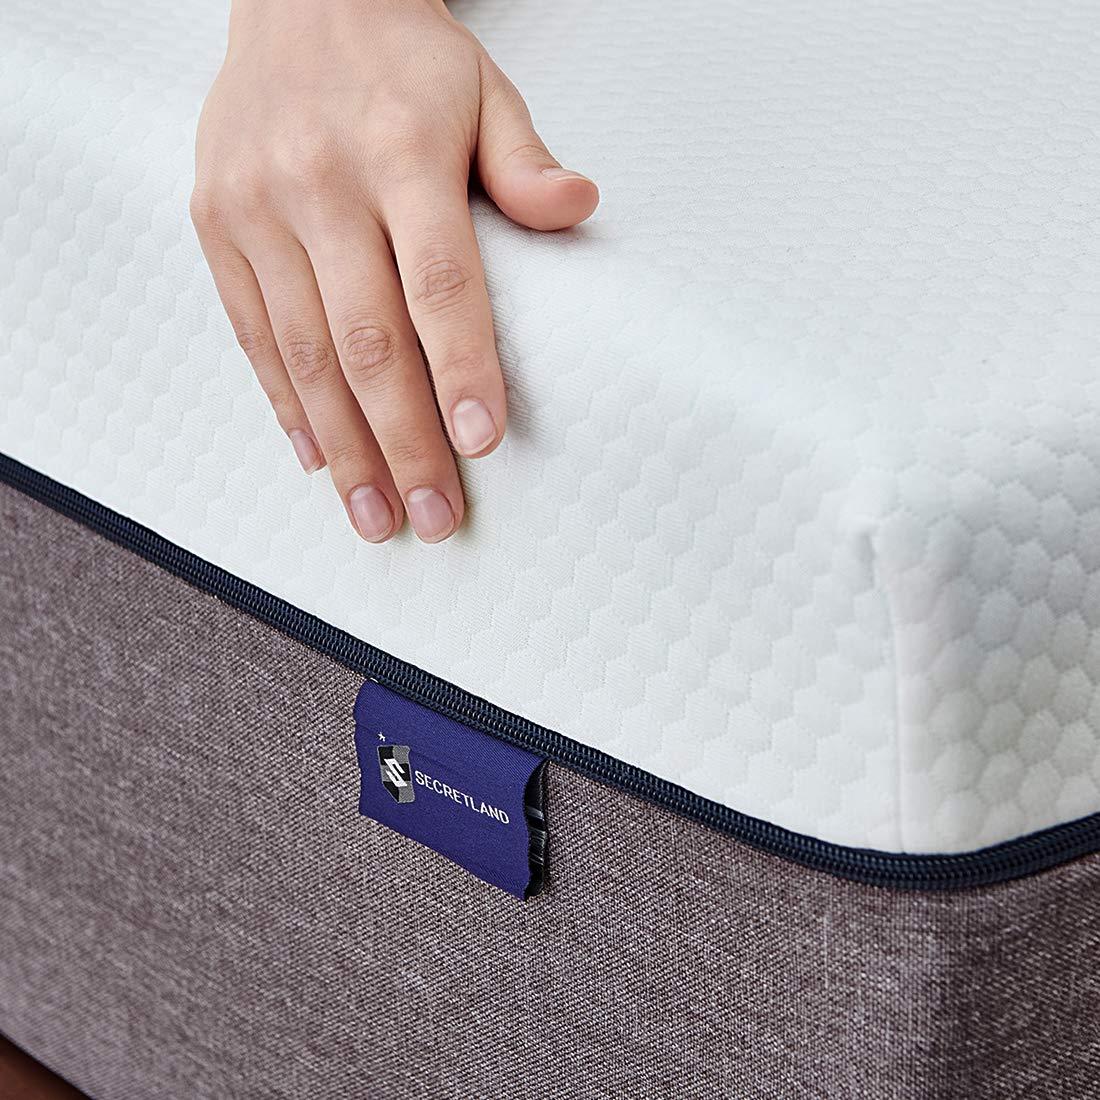 Queen Mattress, Ssecretland 10 inch Gel Memory Foam Mattress with CertiPUR-US Certified Foam, Firm Feels | Bed Mattress in a Box, [Mattress Only] 10-Year Warranty - Queen Size by Ssecretland (Image #6)